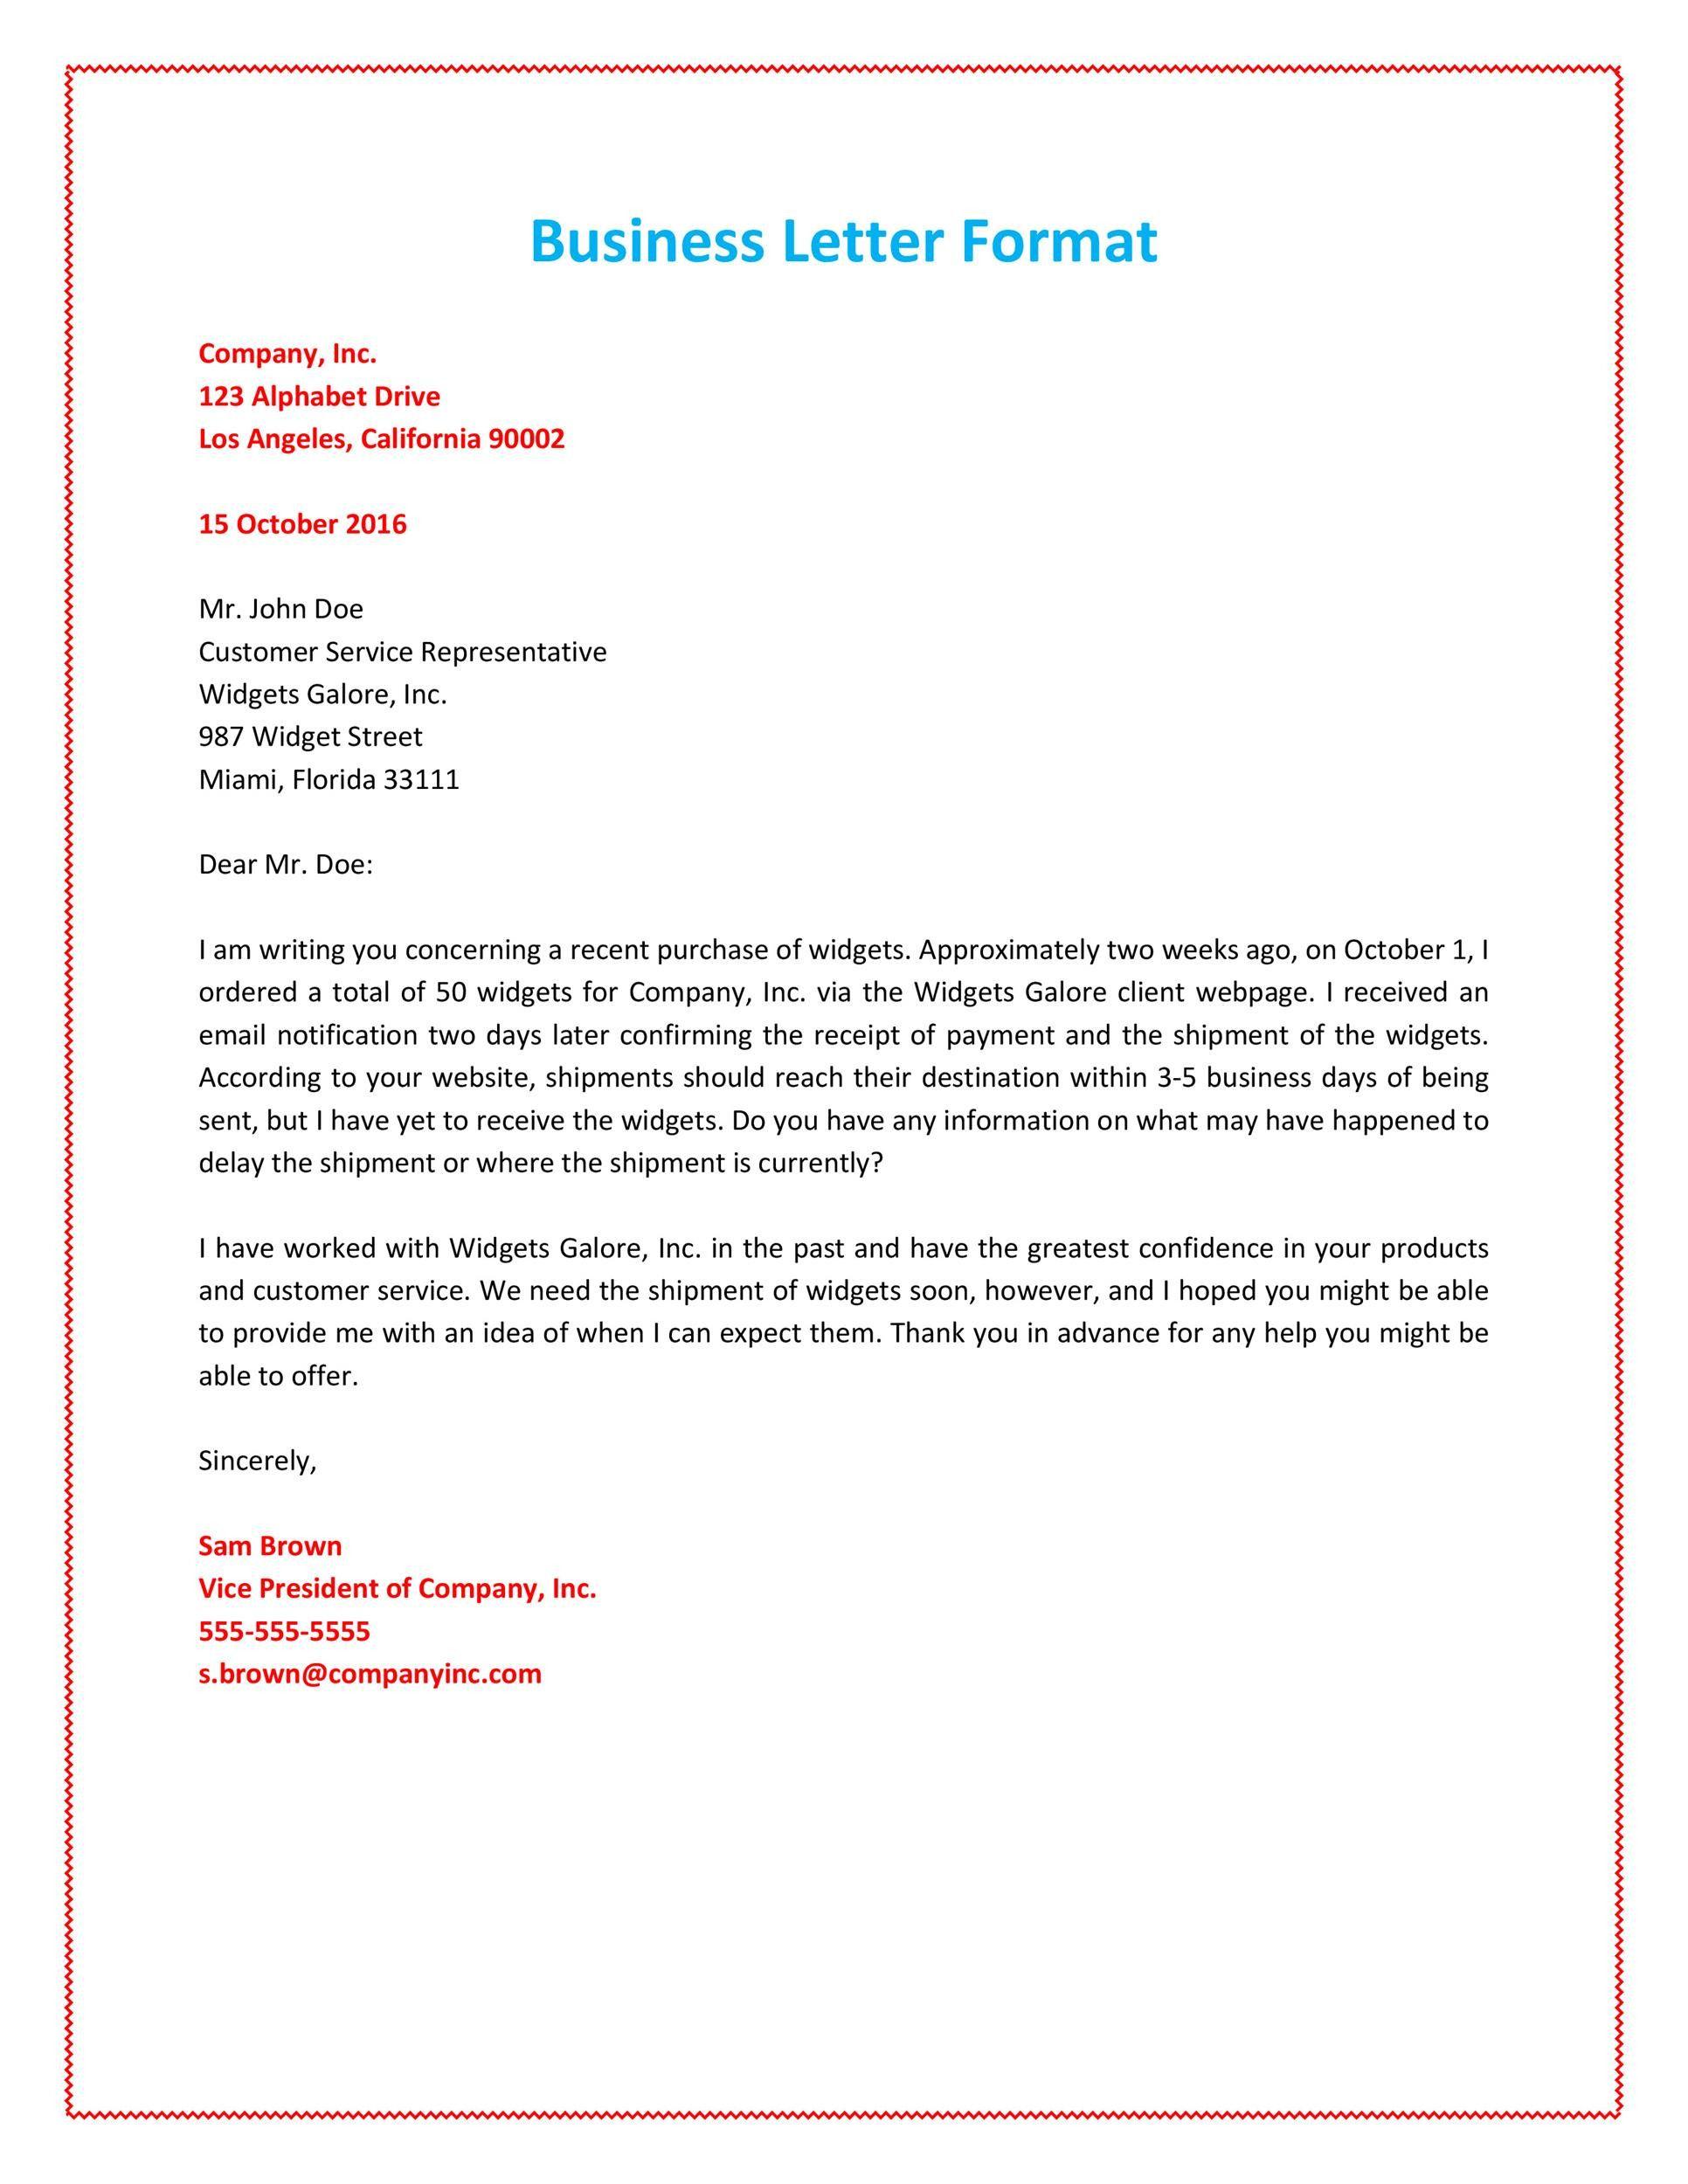 Proper Format For A Letter Business Letter Format Business Letter Format Example Business Letter Example